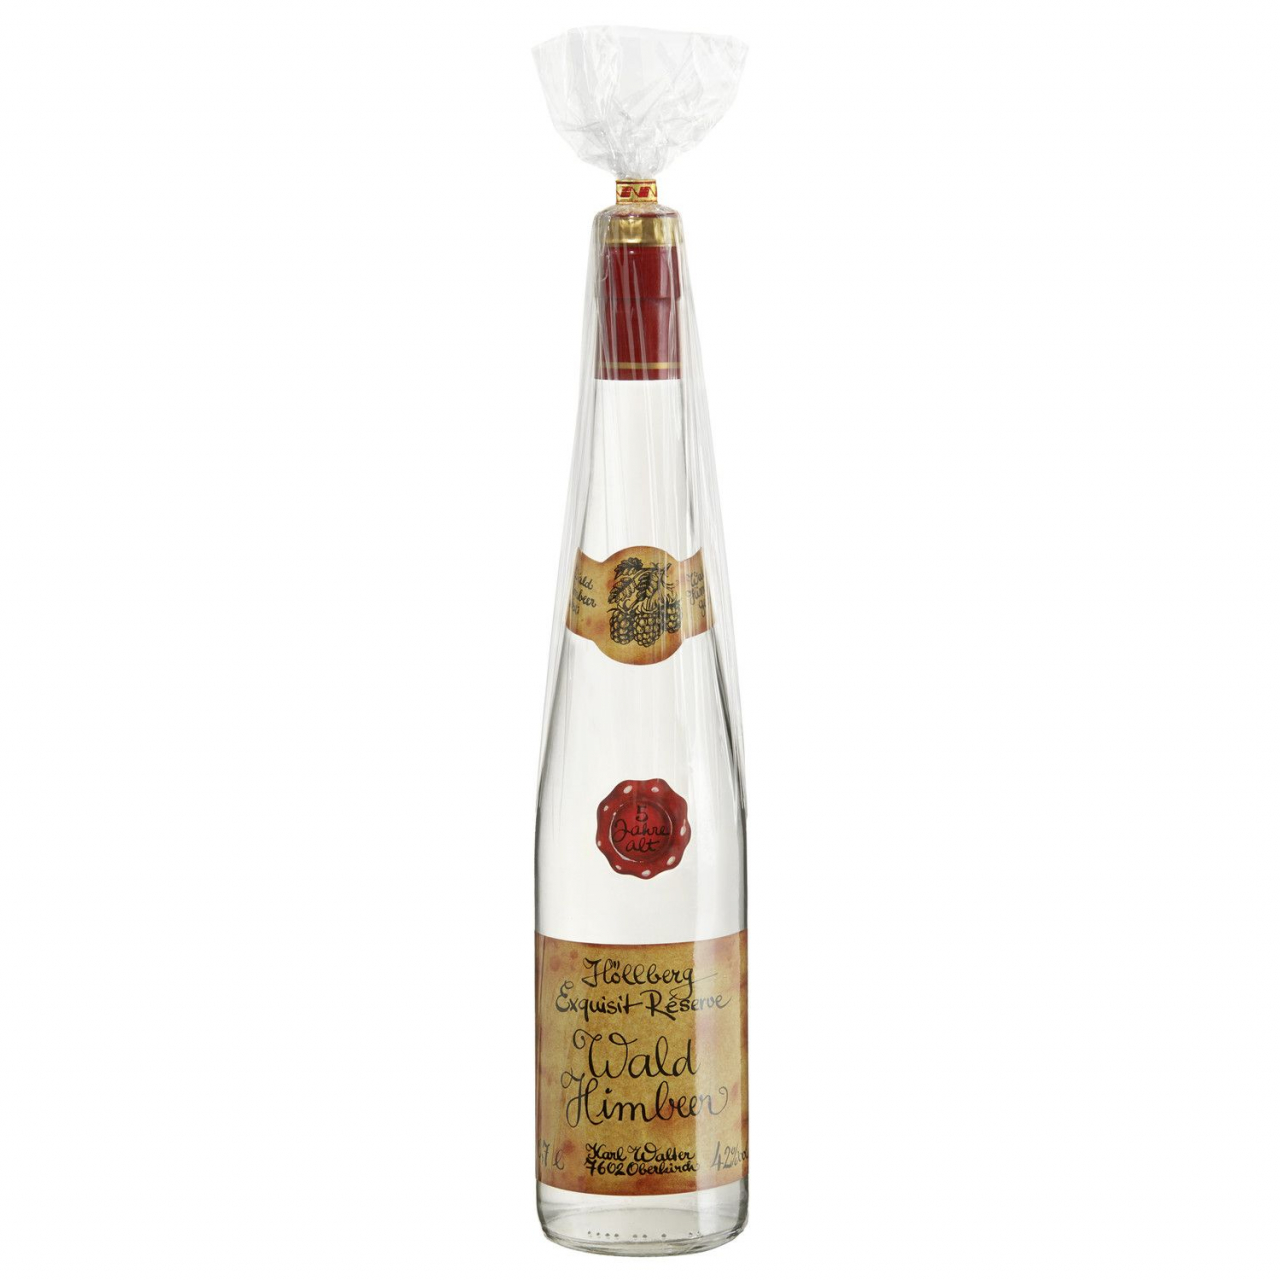 0,7 Liter Flasche Höllberg Exquisit Réserve Wald Himbeere